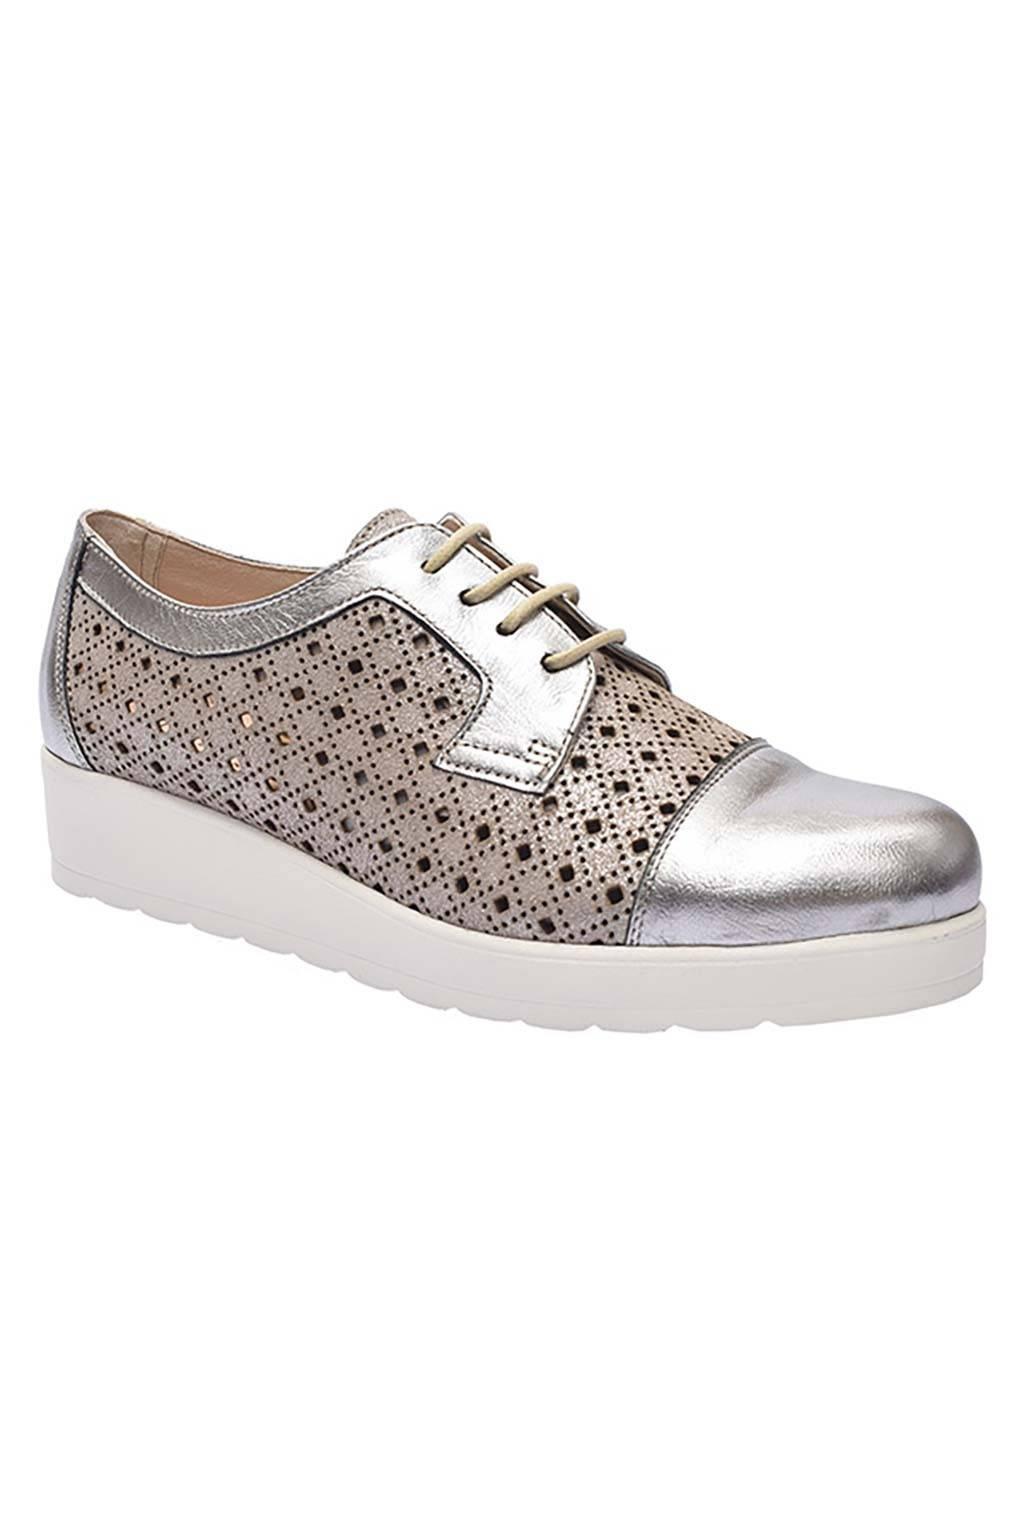 Tolino Zapato 16519p es Mujer Medinapiel mNnyv80wO